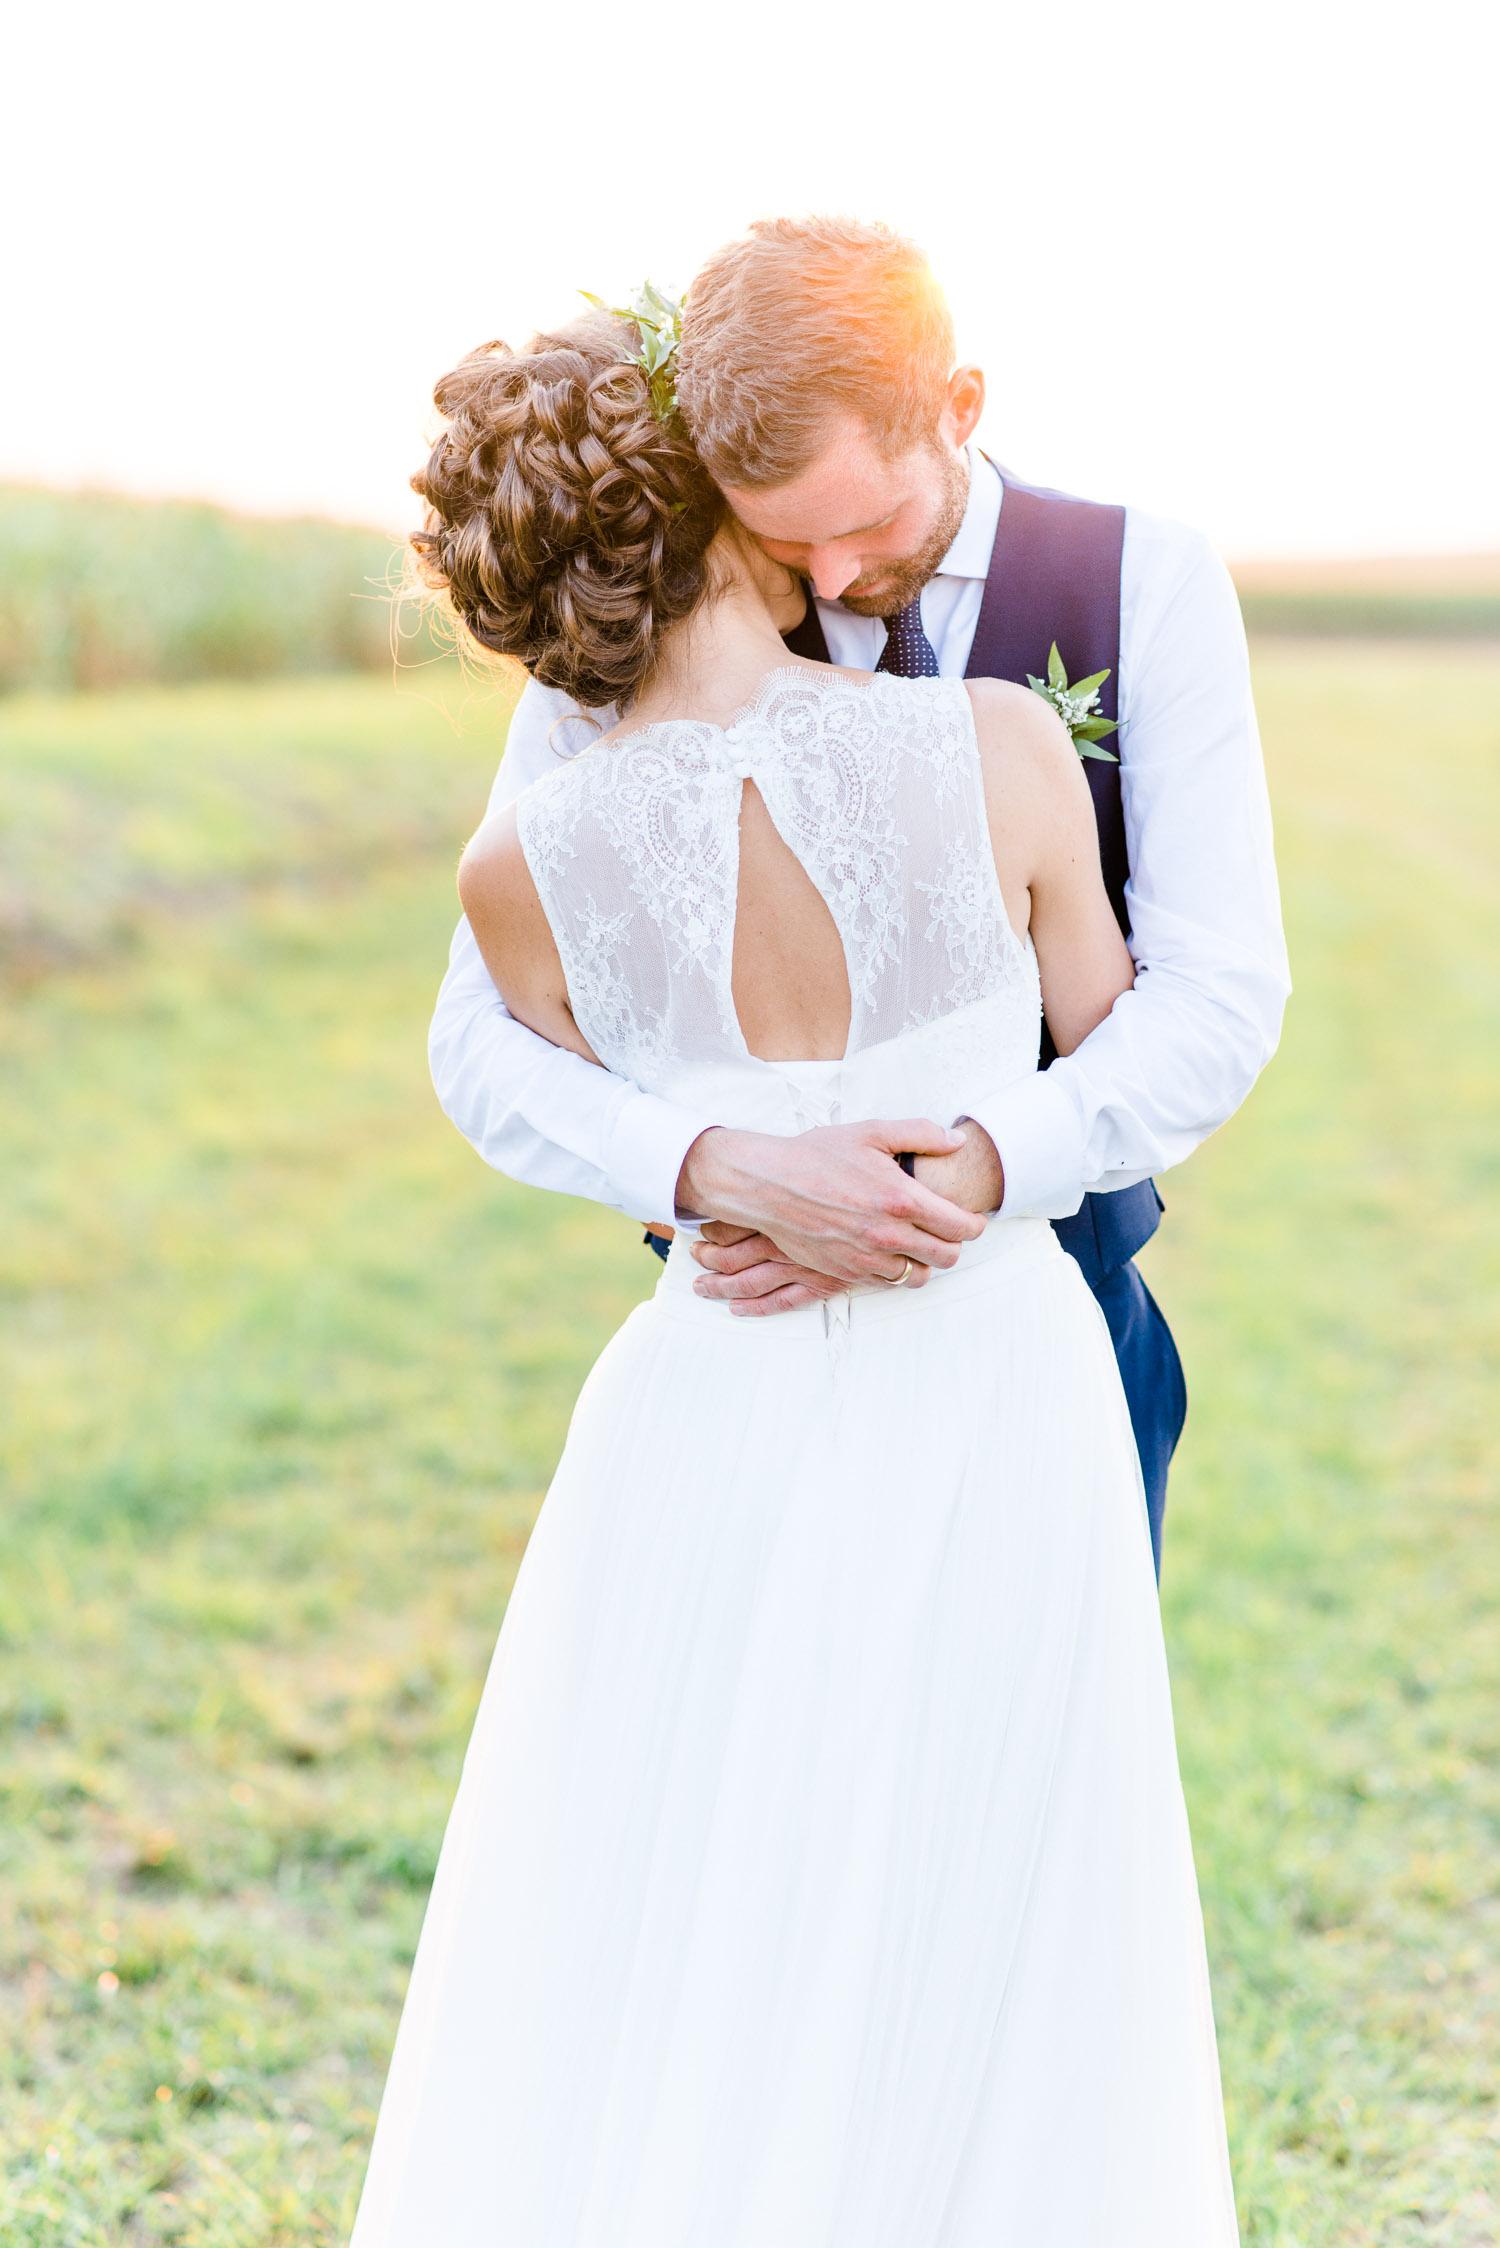 Vintage Hochzeit Was Anziehen Vintage Moments Vintage Moments